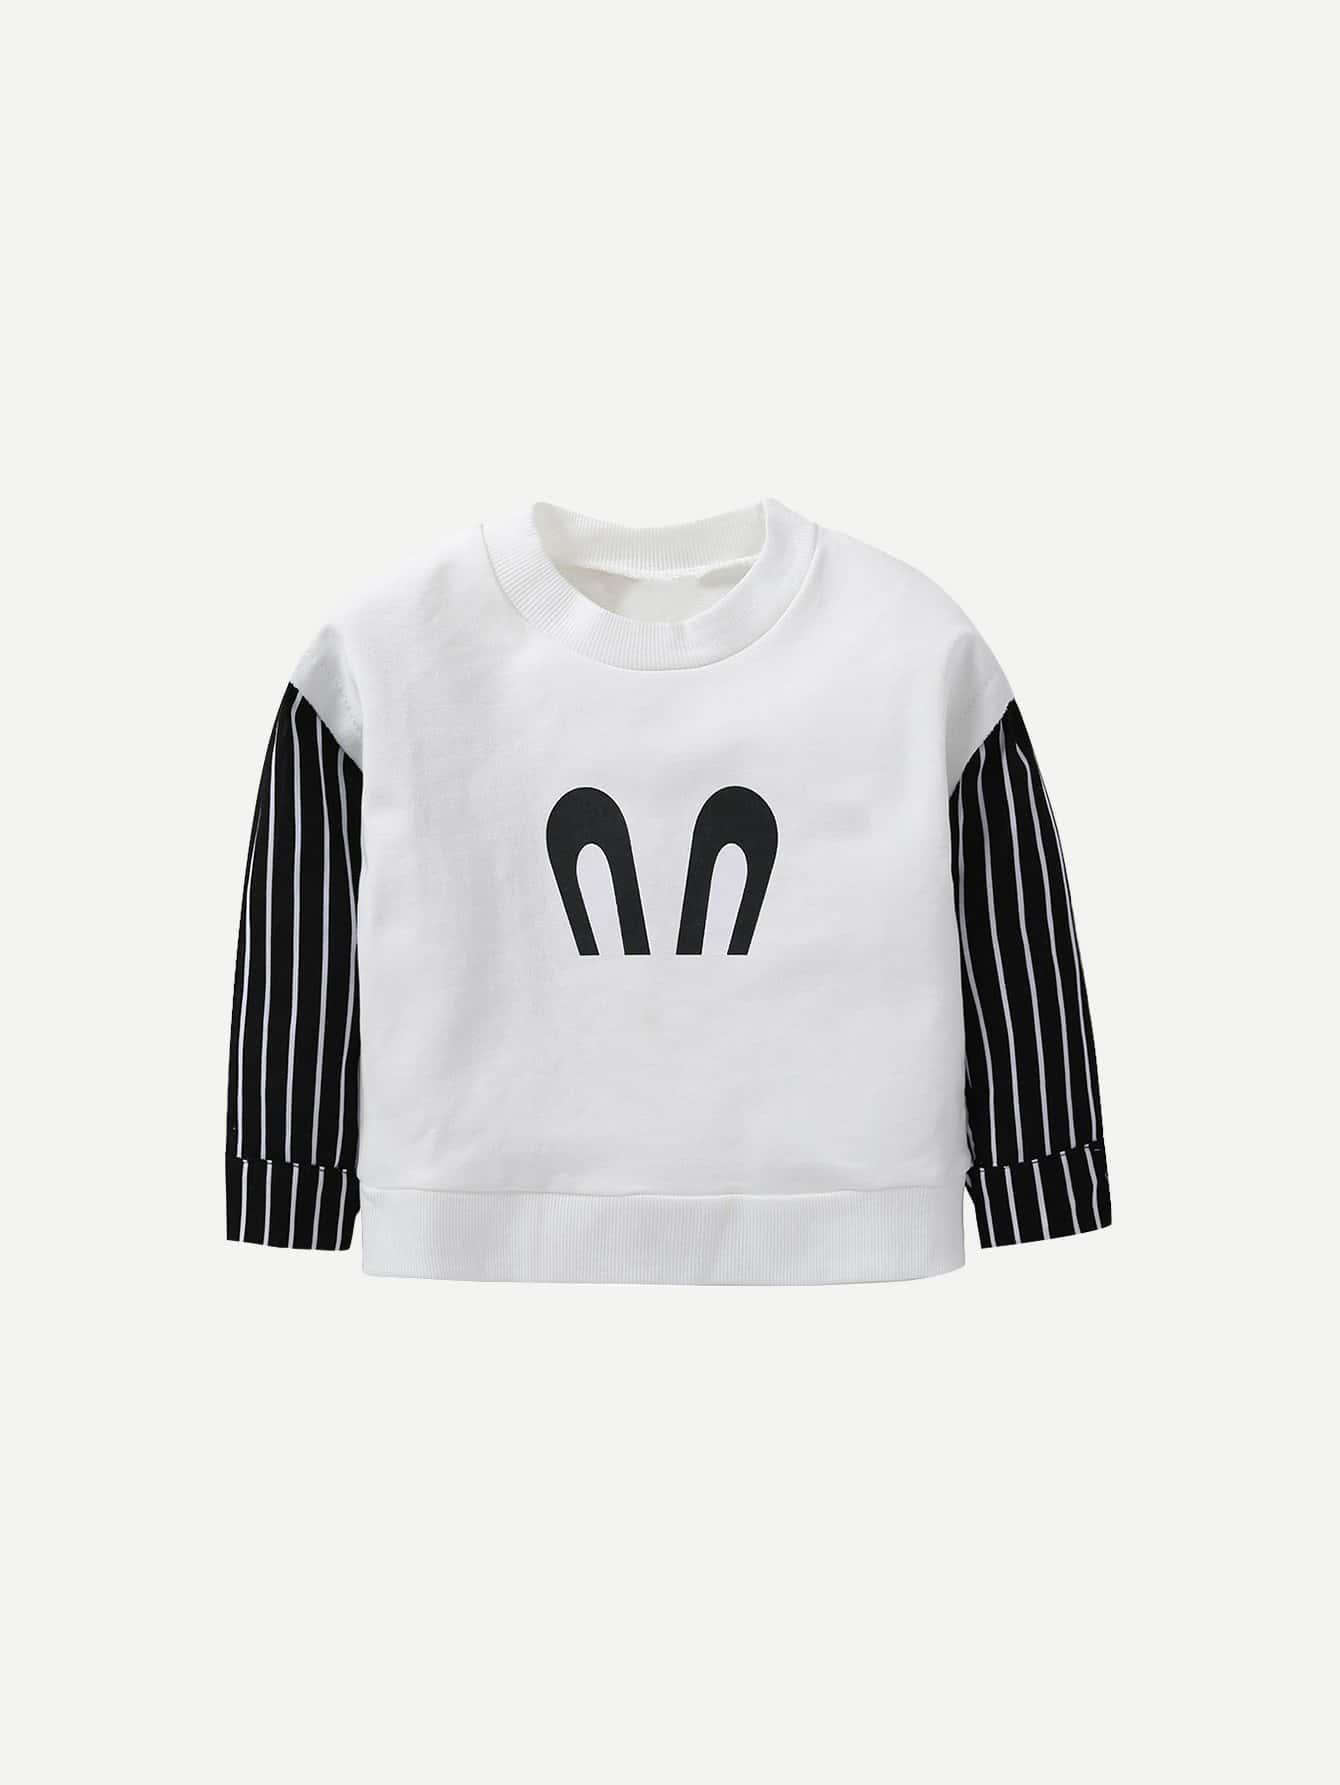 Boys Cartoon Print Contrast Striped Sleeve Sweatshirts